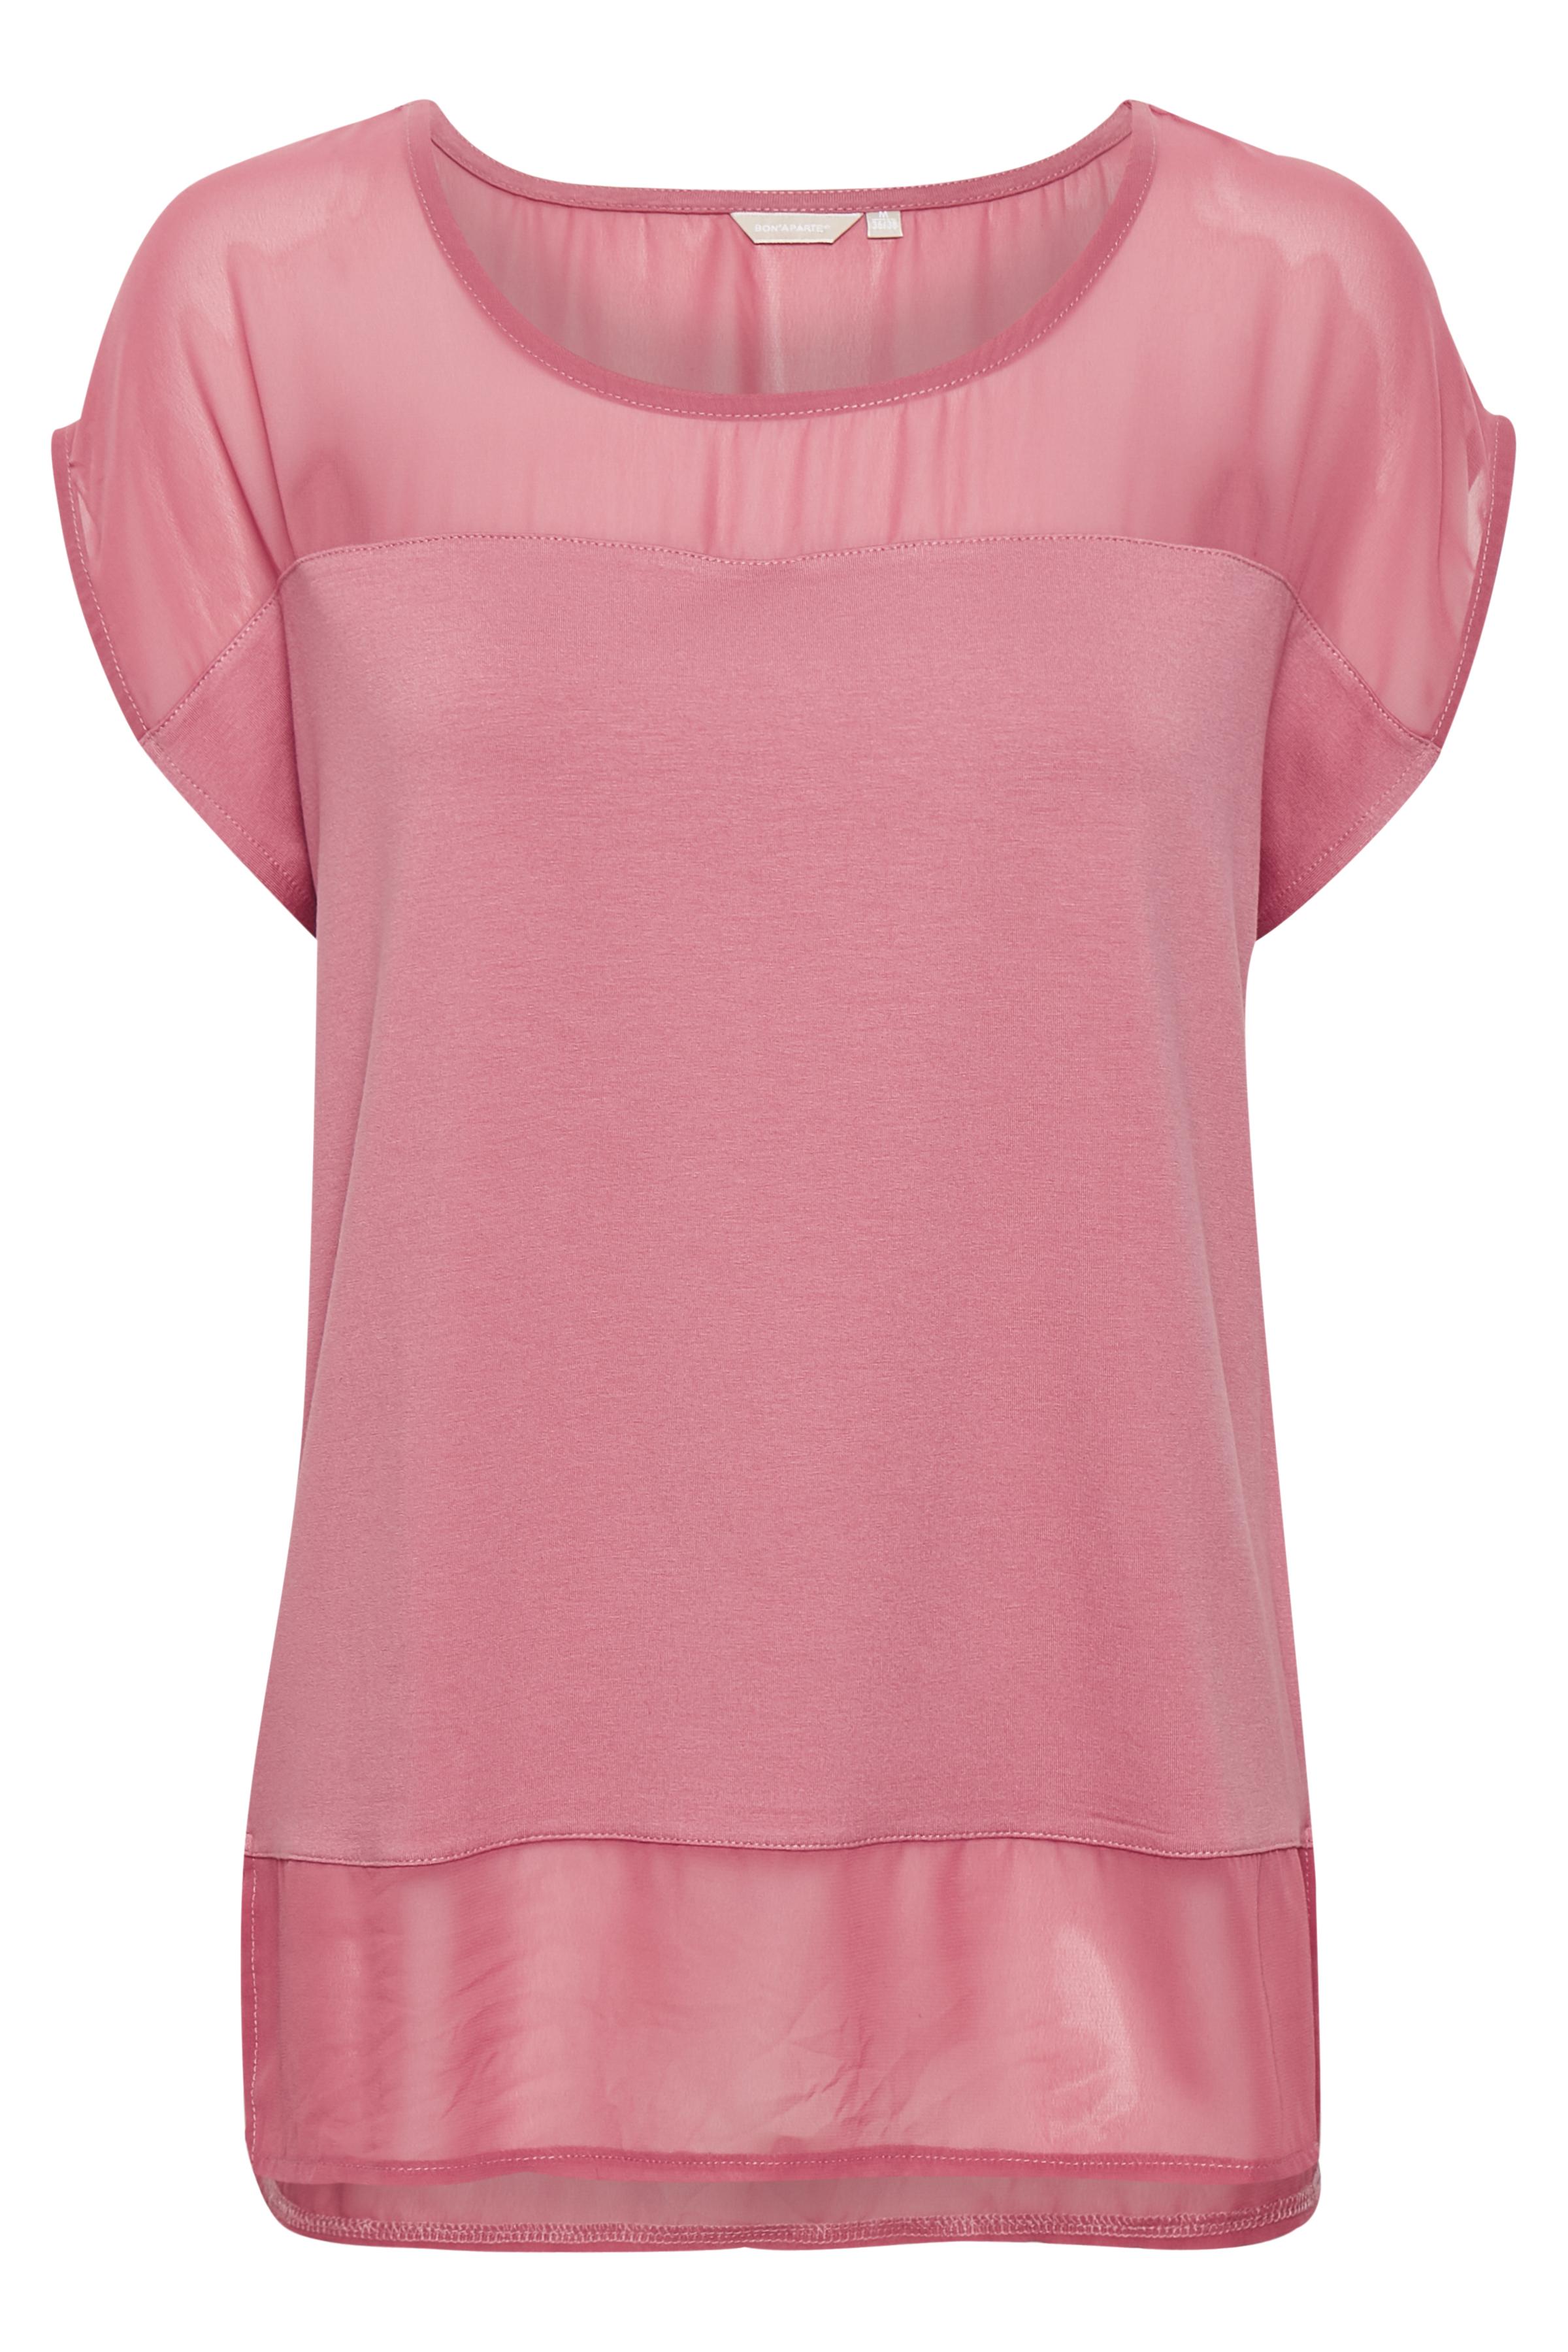 Donkerroze Korte mouwen T-shirt  van Bon'A Parte – Door Donkerroze Korte mouwen T-shirt  van maat. S-2XL hier